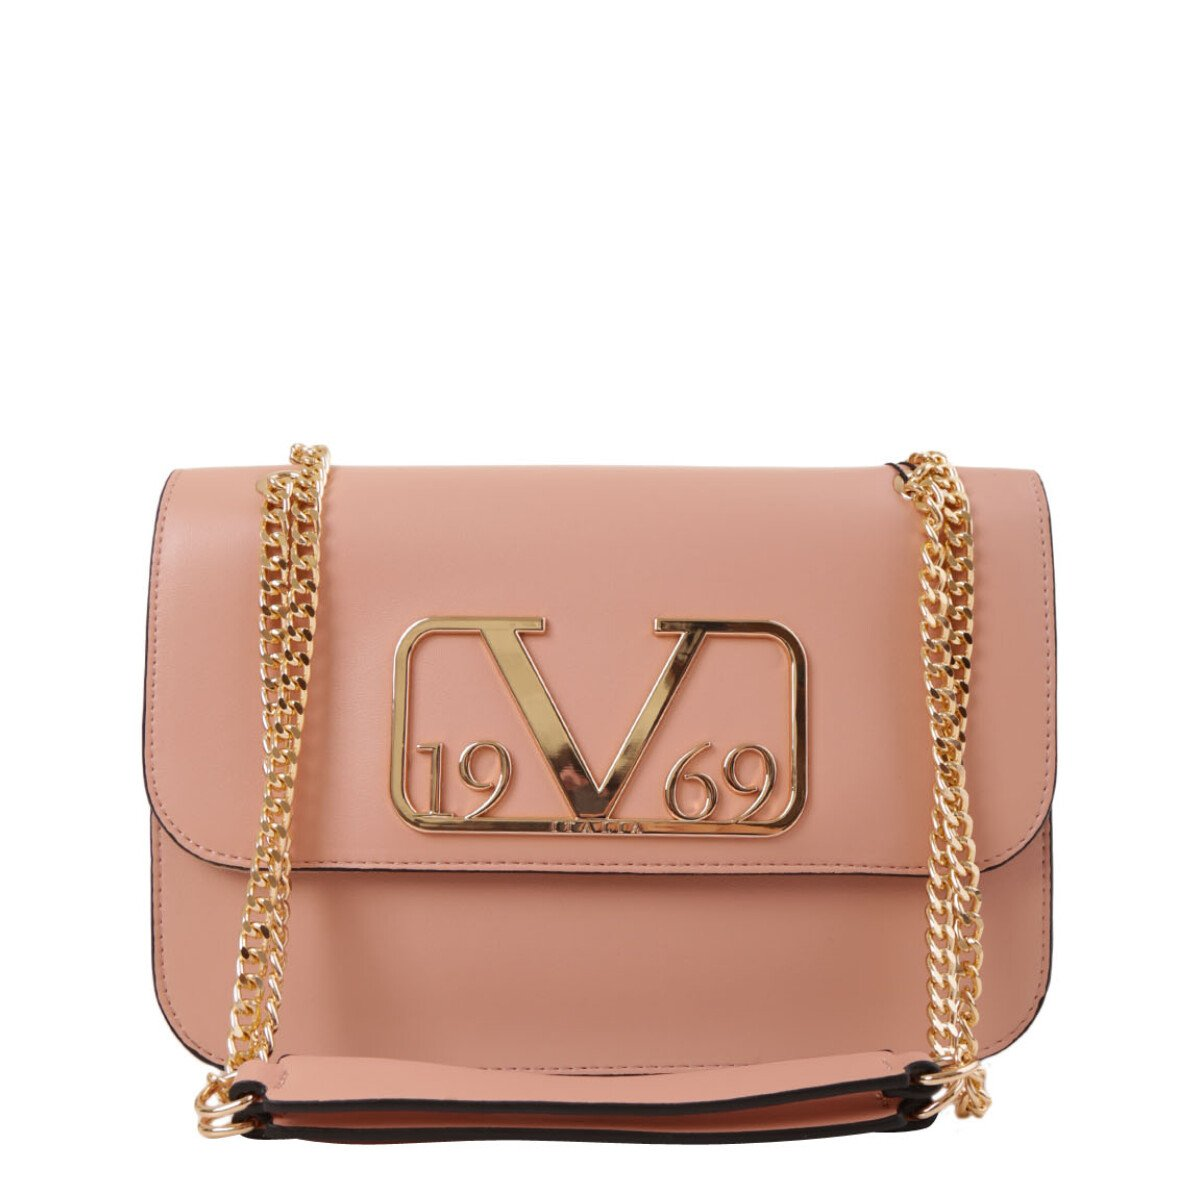 19v69 Italia Women's Handbag Various Colours 318965 - pink UNICA